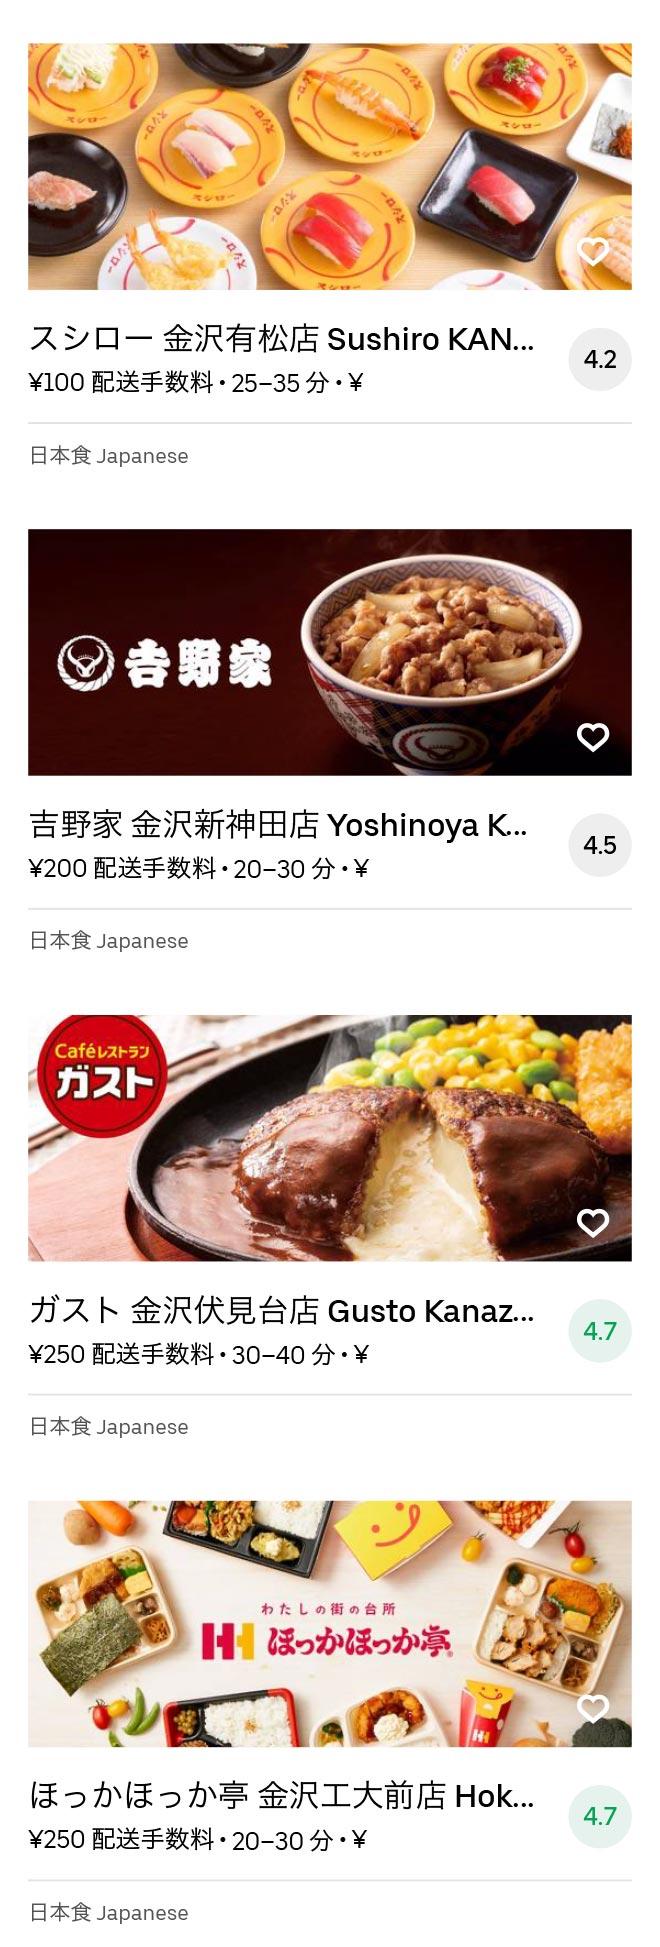 Nishi kanazawa menu 2009 03